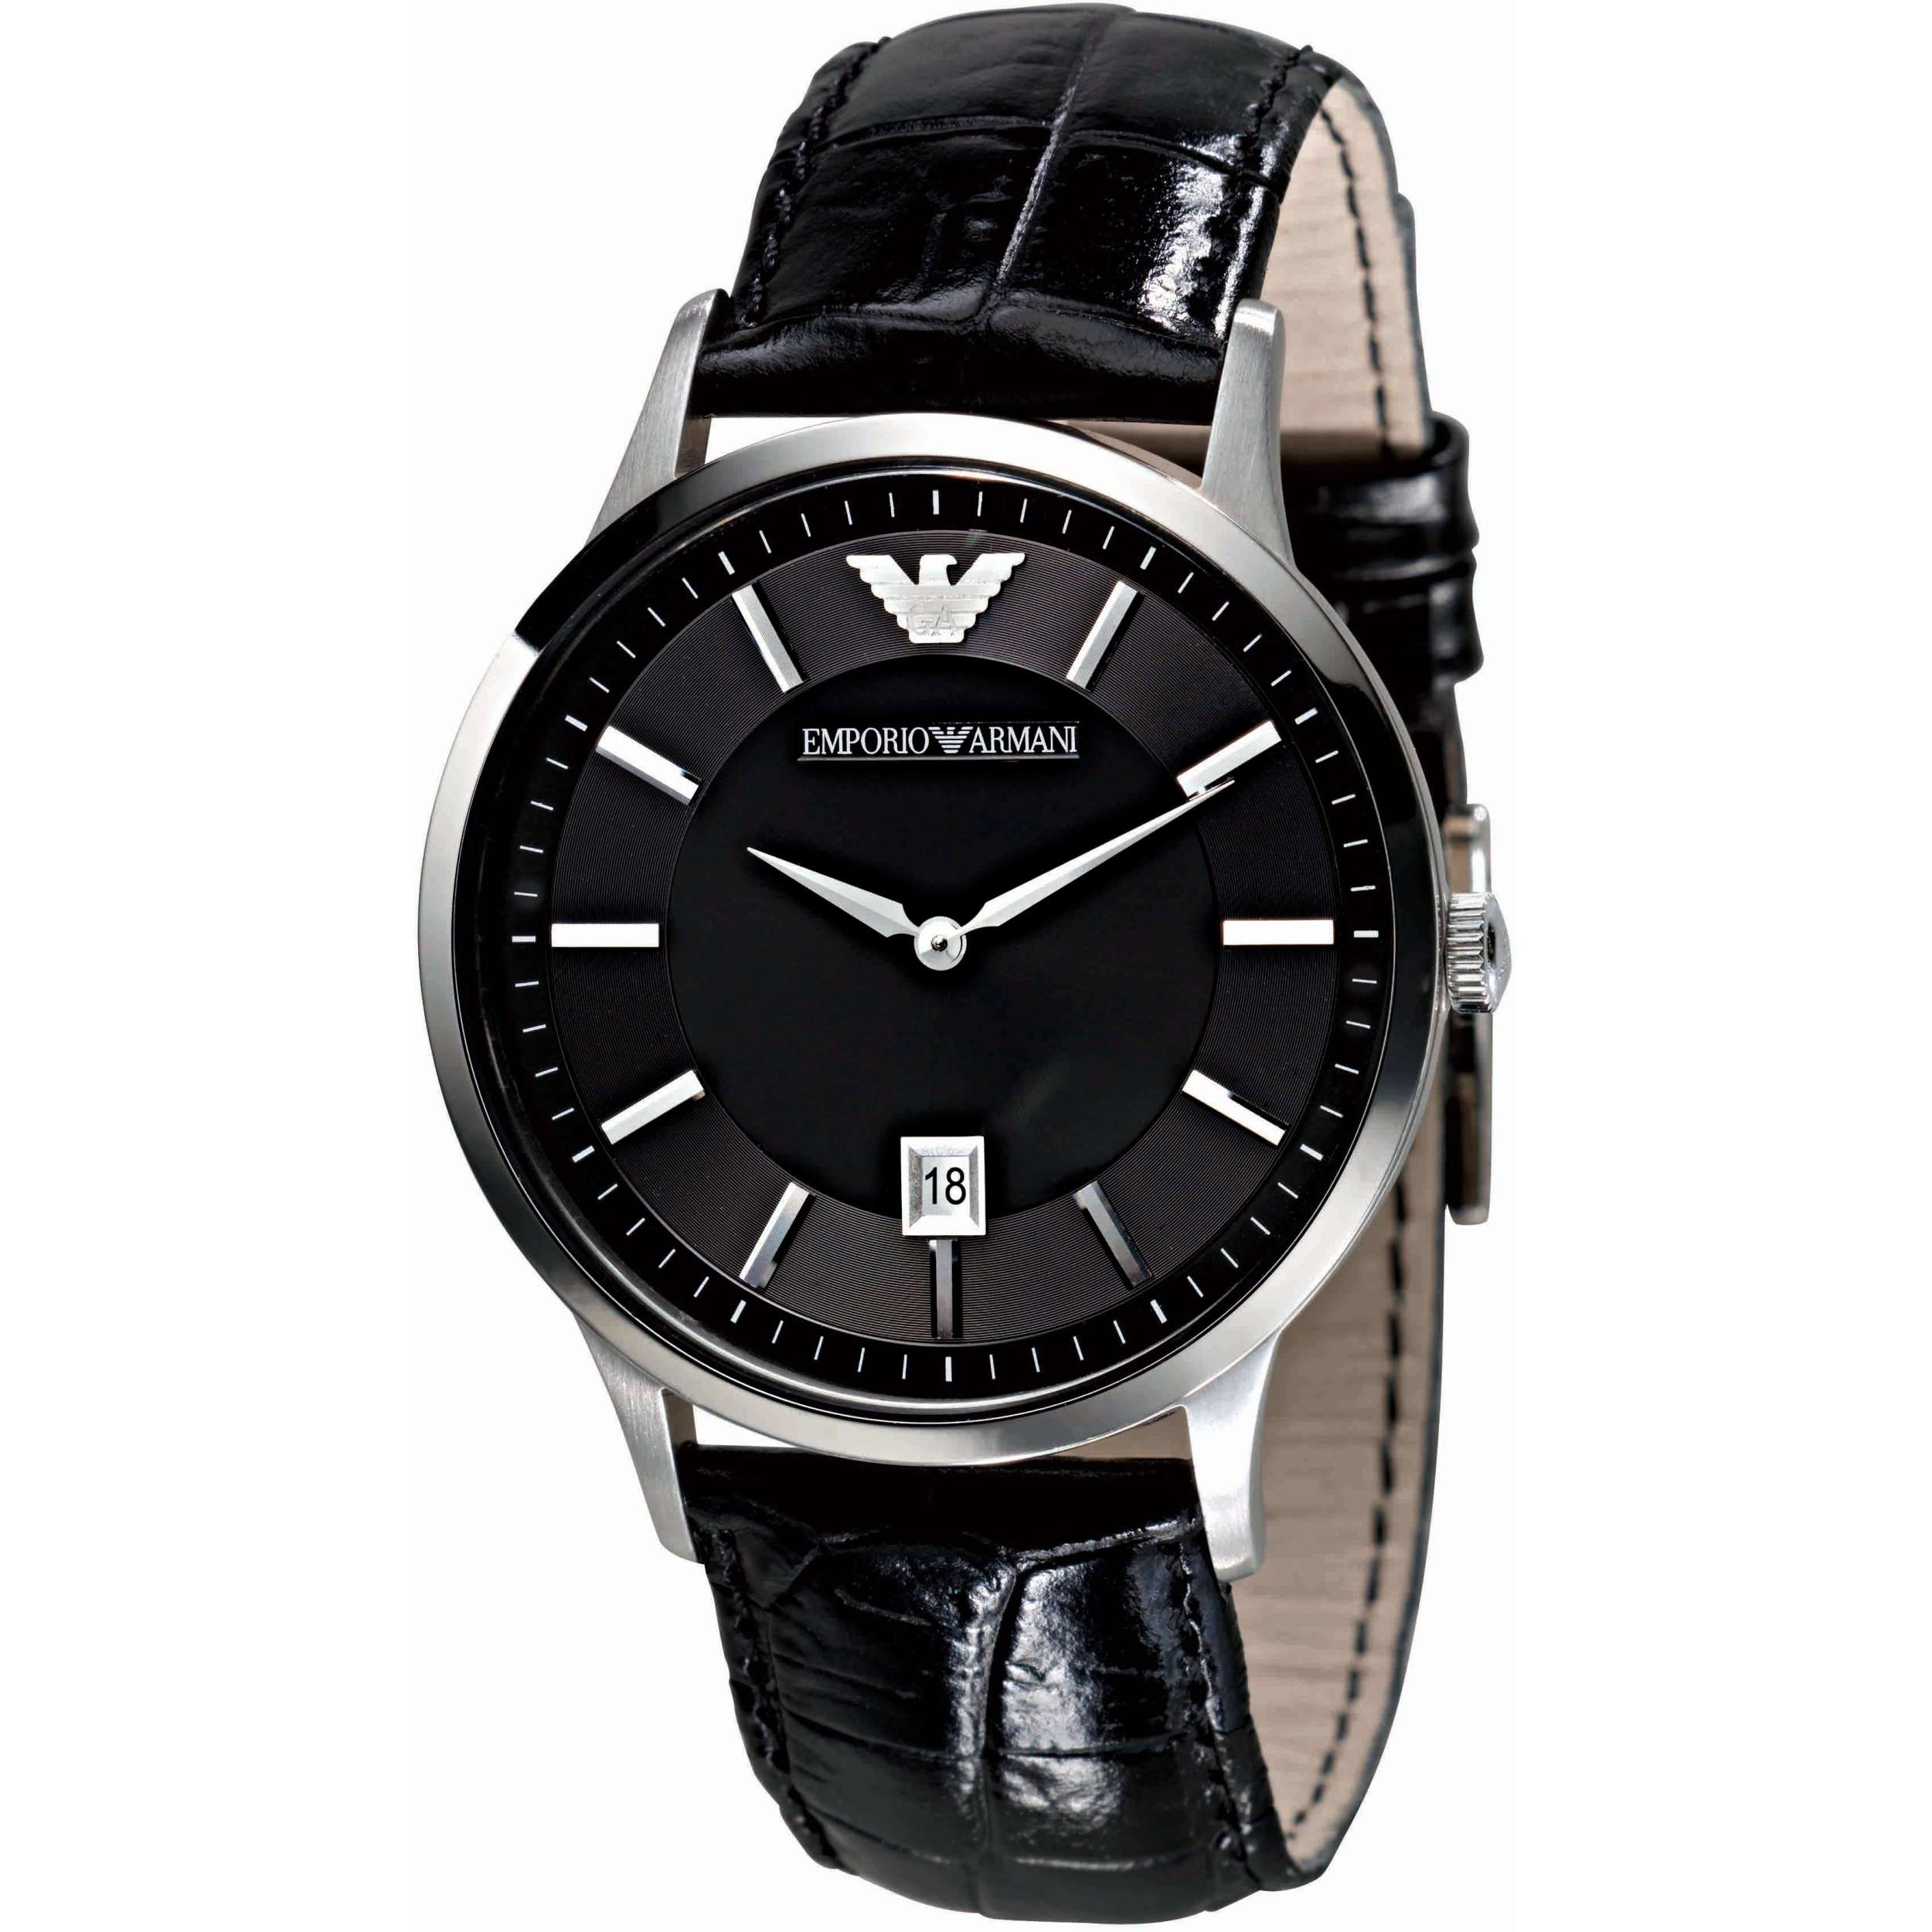 Montre Homme Emporio Armani AR2411   FR   Watch Shop™ 9ea5d798ca7b